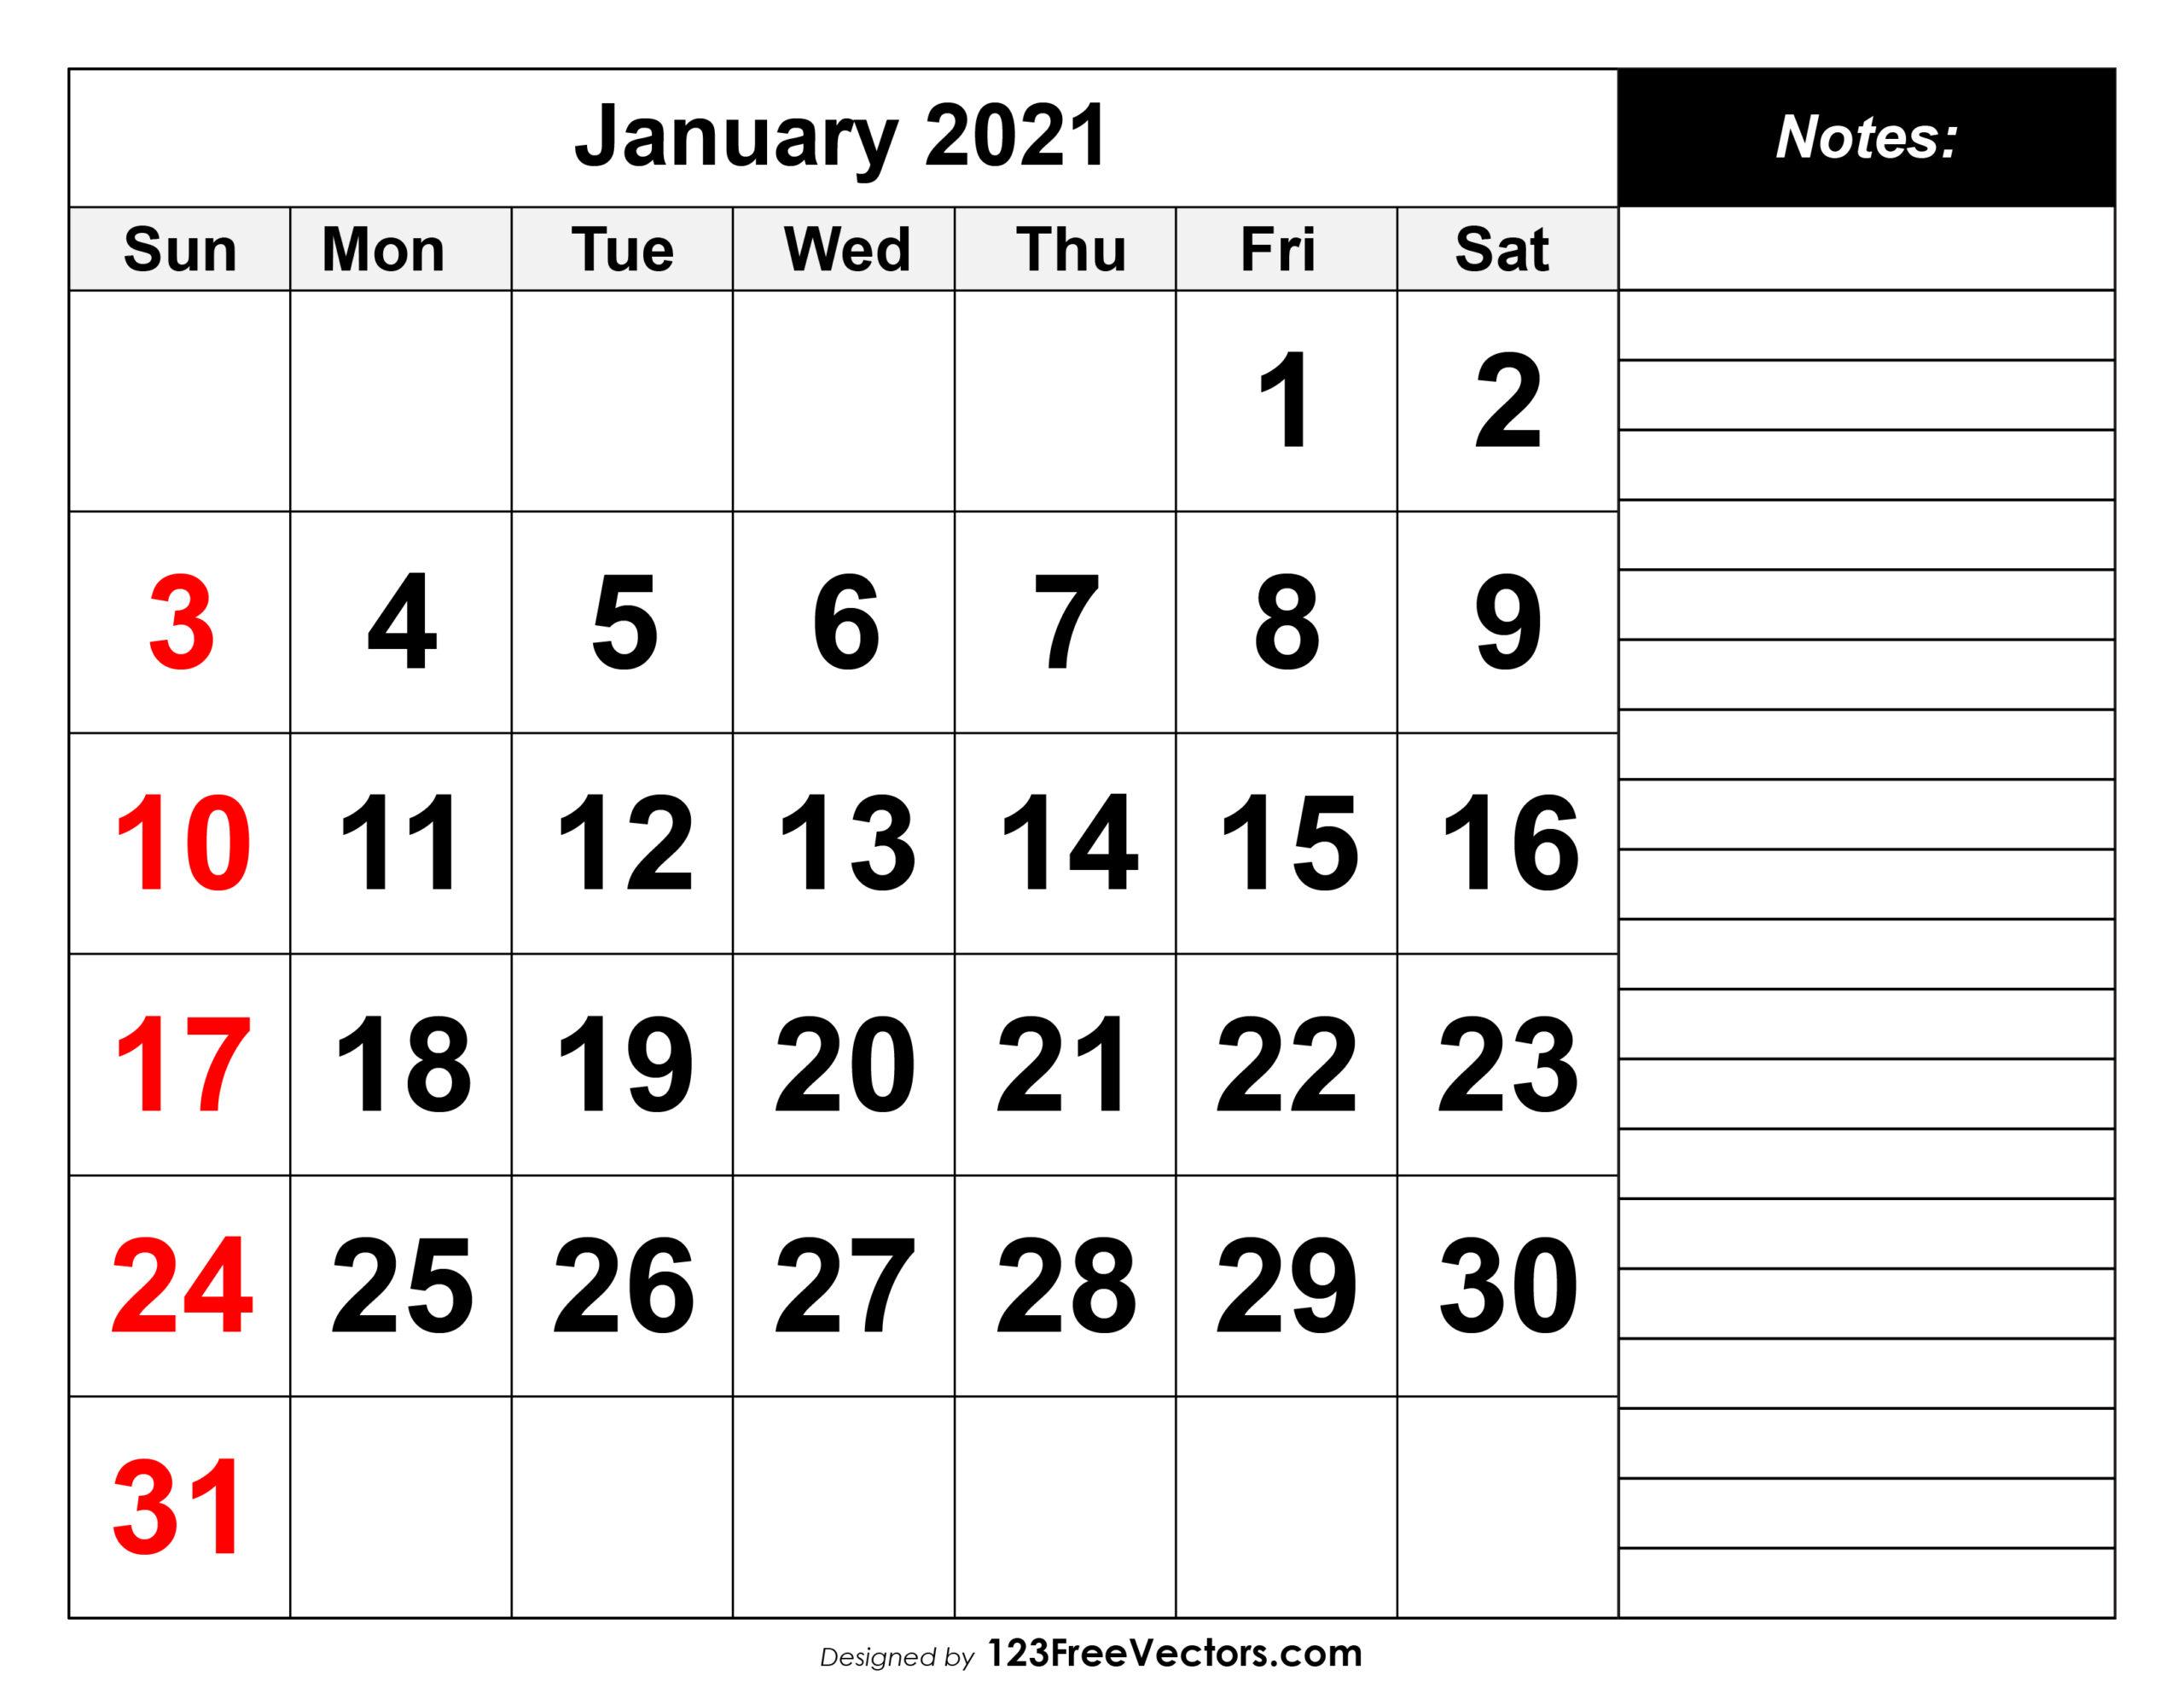 Free January 2021 Printable Calendar regarding Free Printable Calendar With Lines On Days 2021